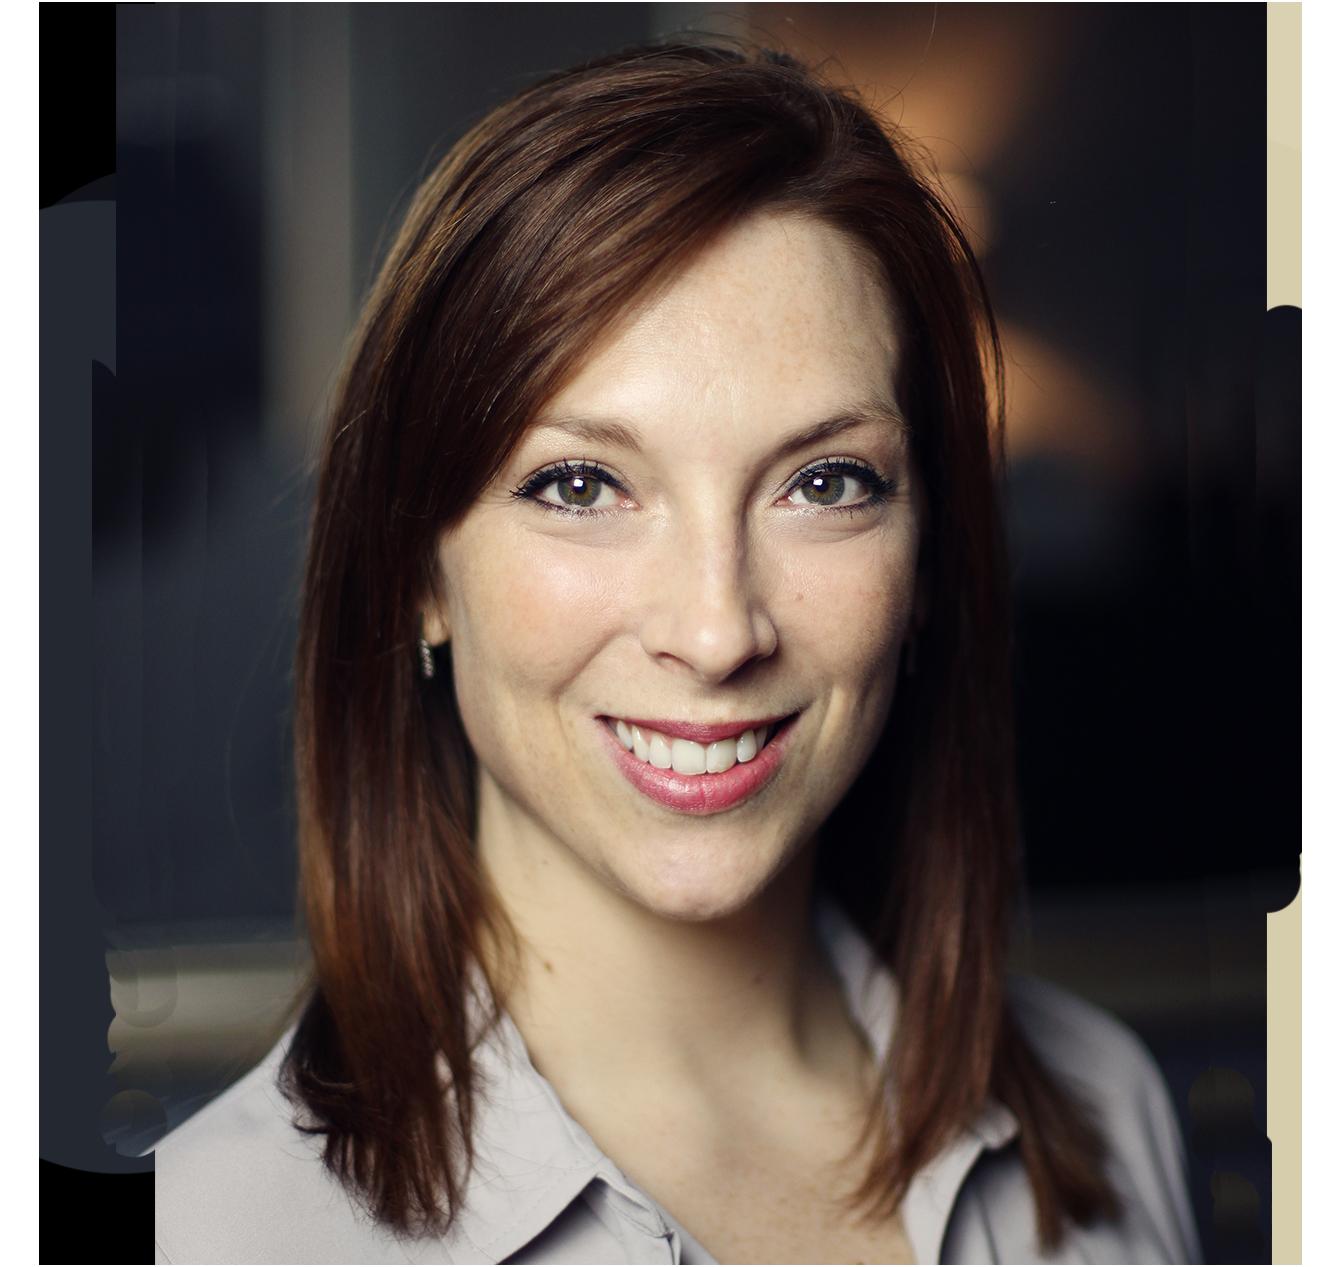 Lisa Jones - Psychotherapist and wellness coach